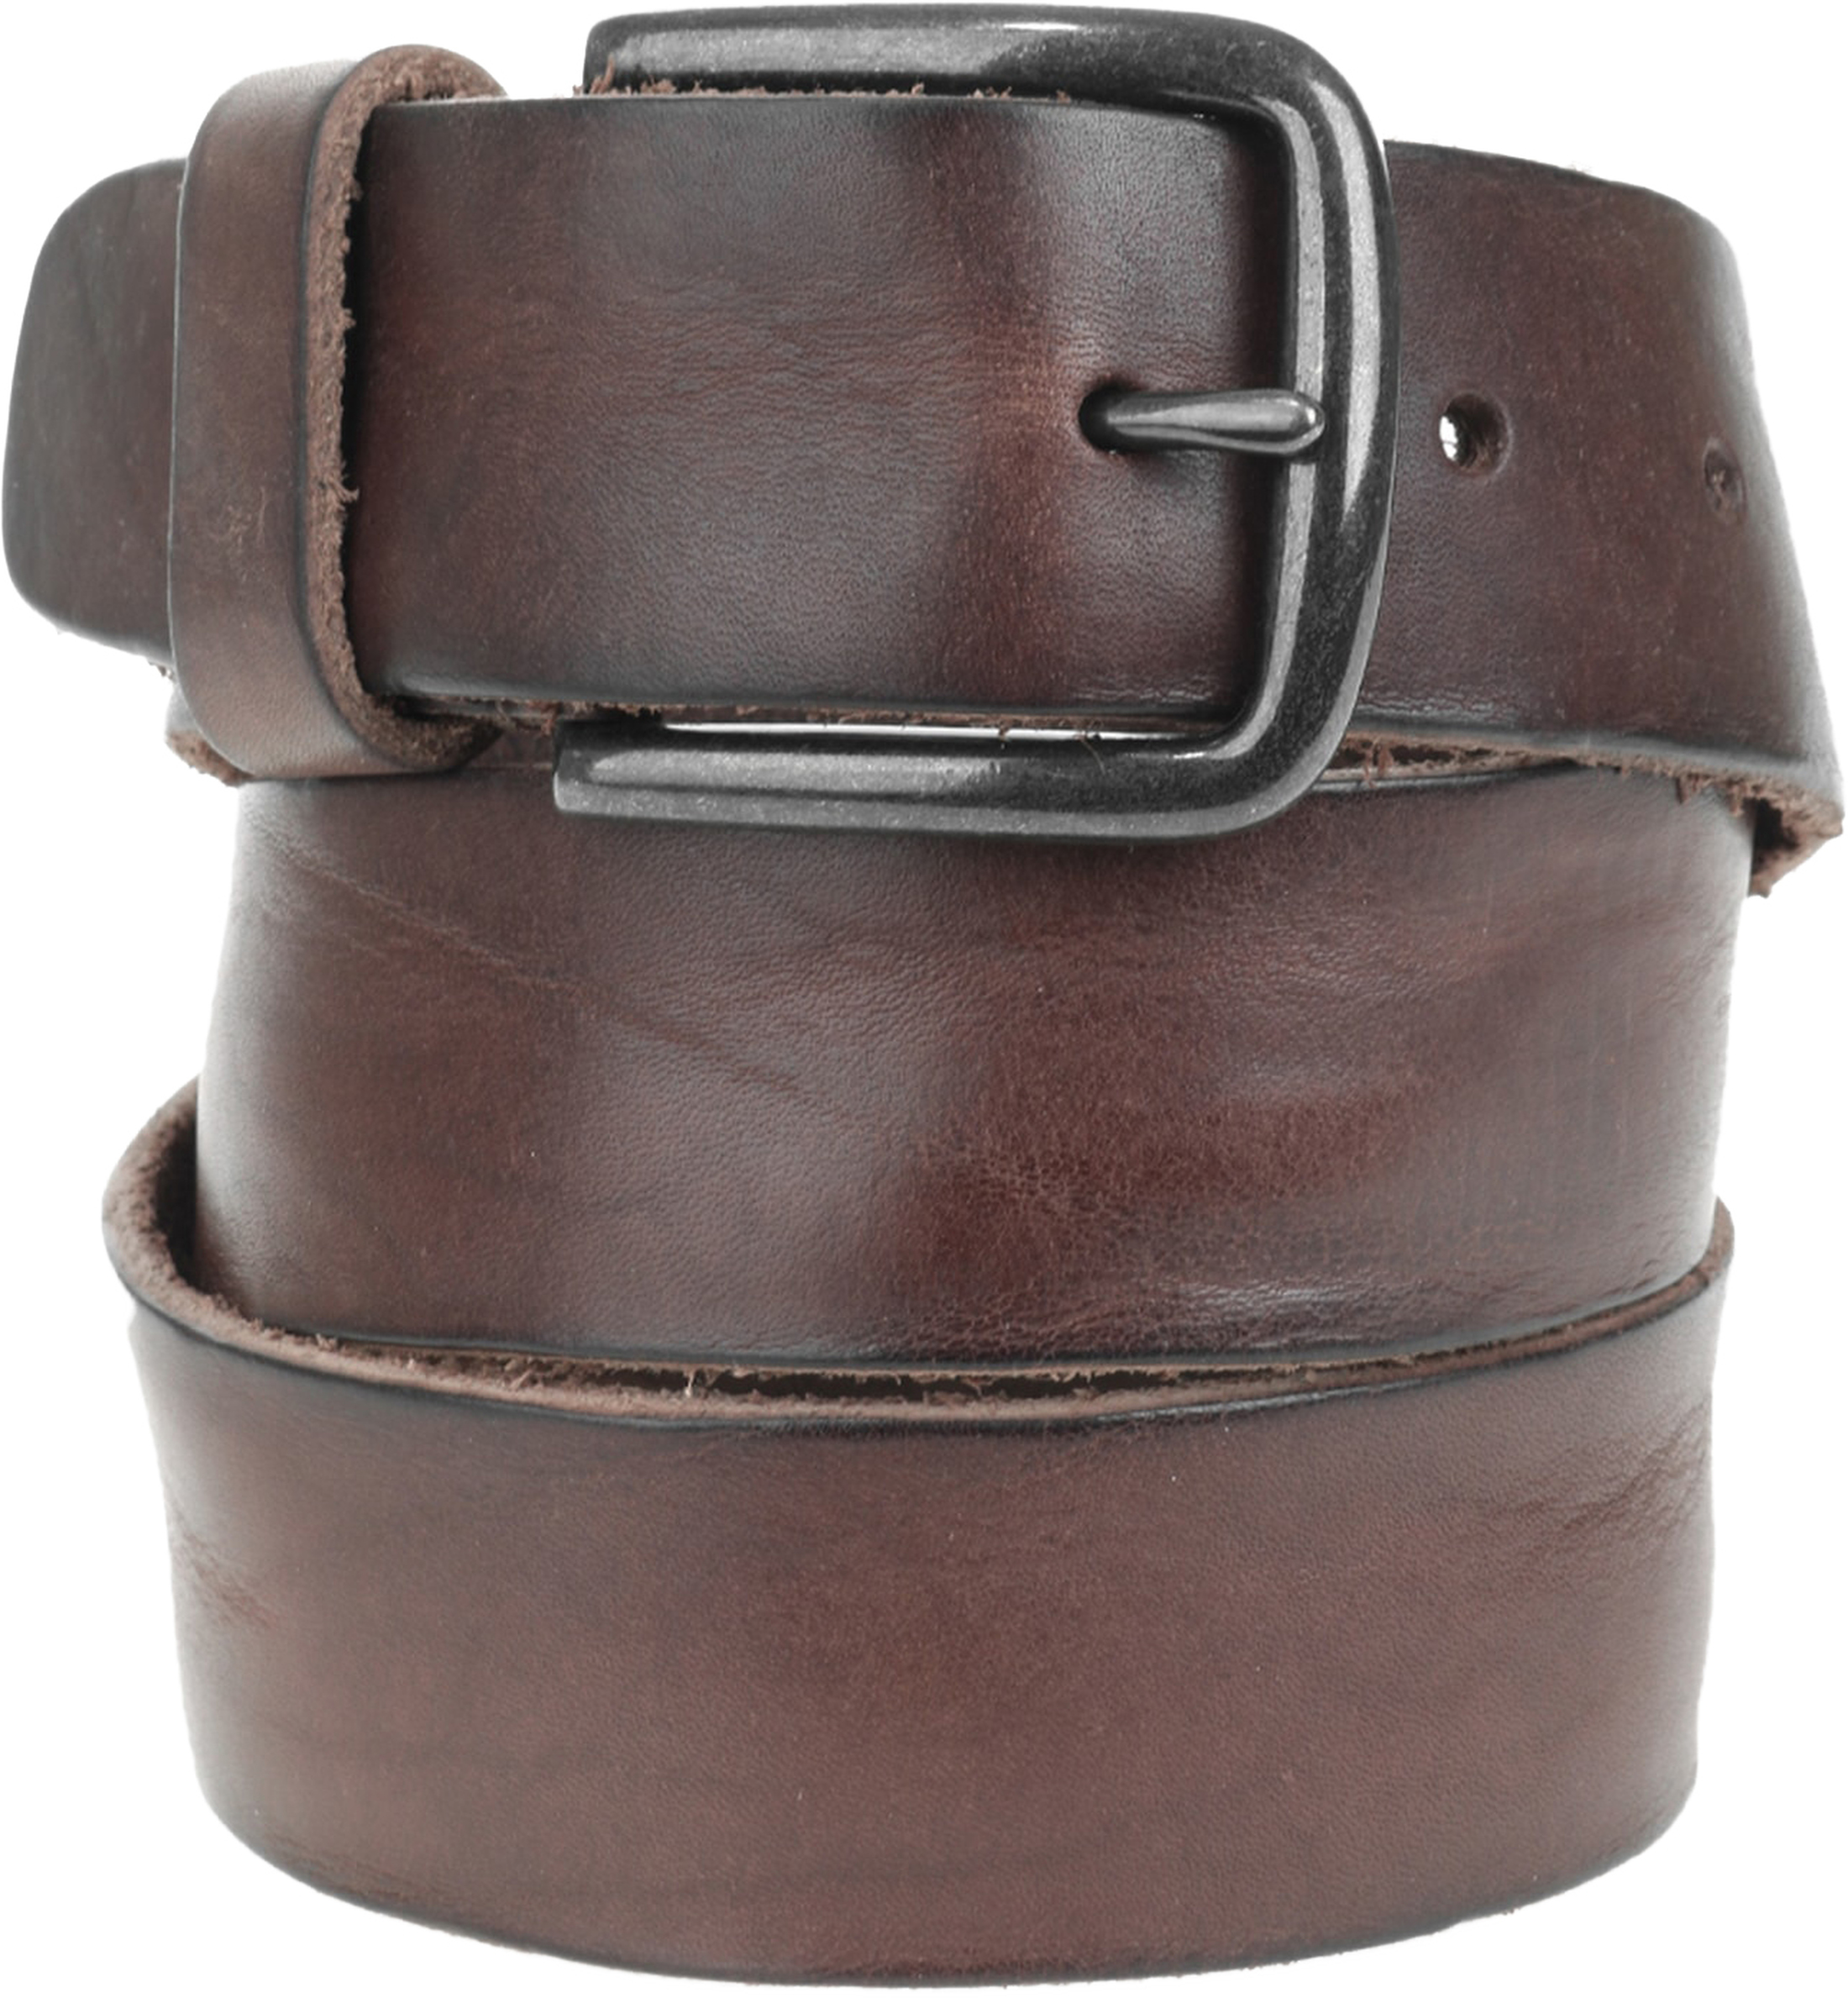 Suitable Belt Casual Brown 002 foto 0